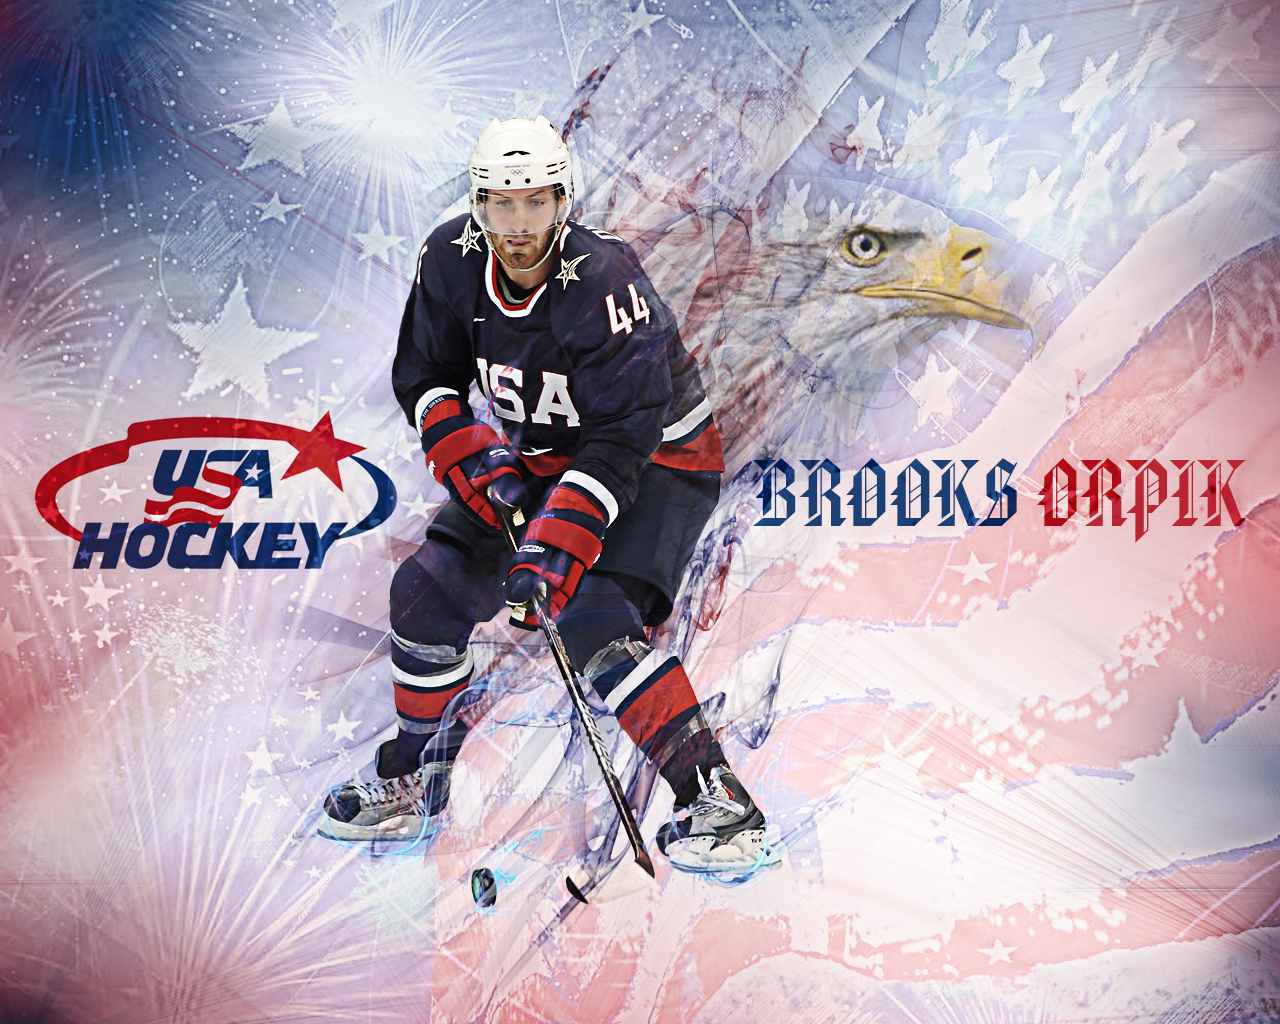 47+ USA Hockey Wallpaper on WallpaperSafari